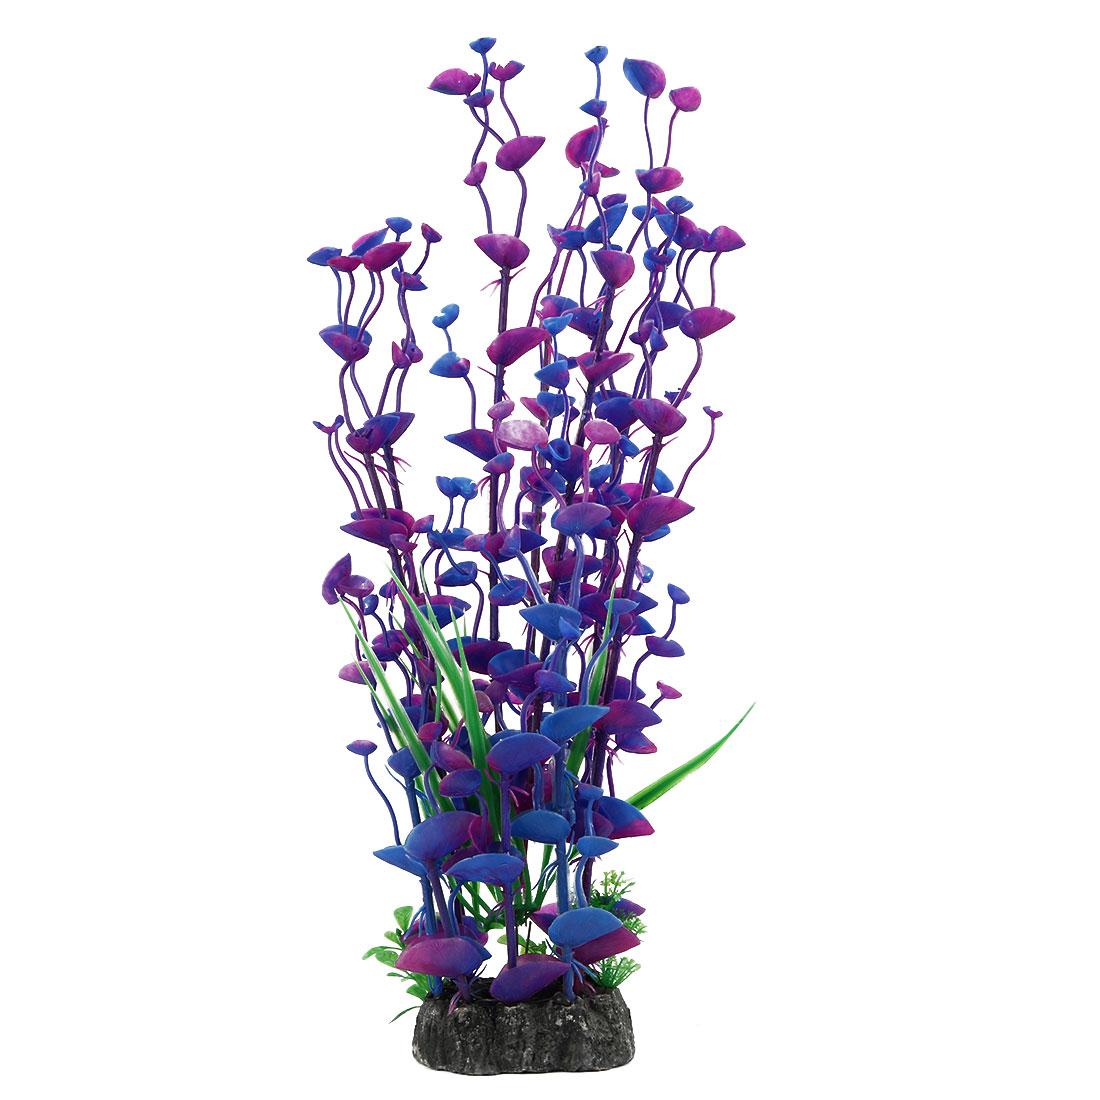 Aquarium Artificial Plant Grass Decoration Blue Fuchsia 15.4 Inches Height